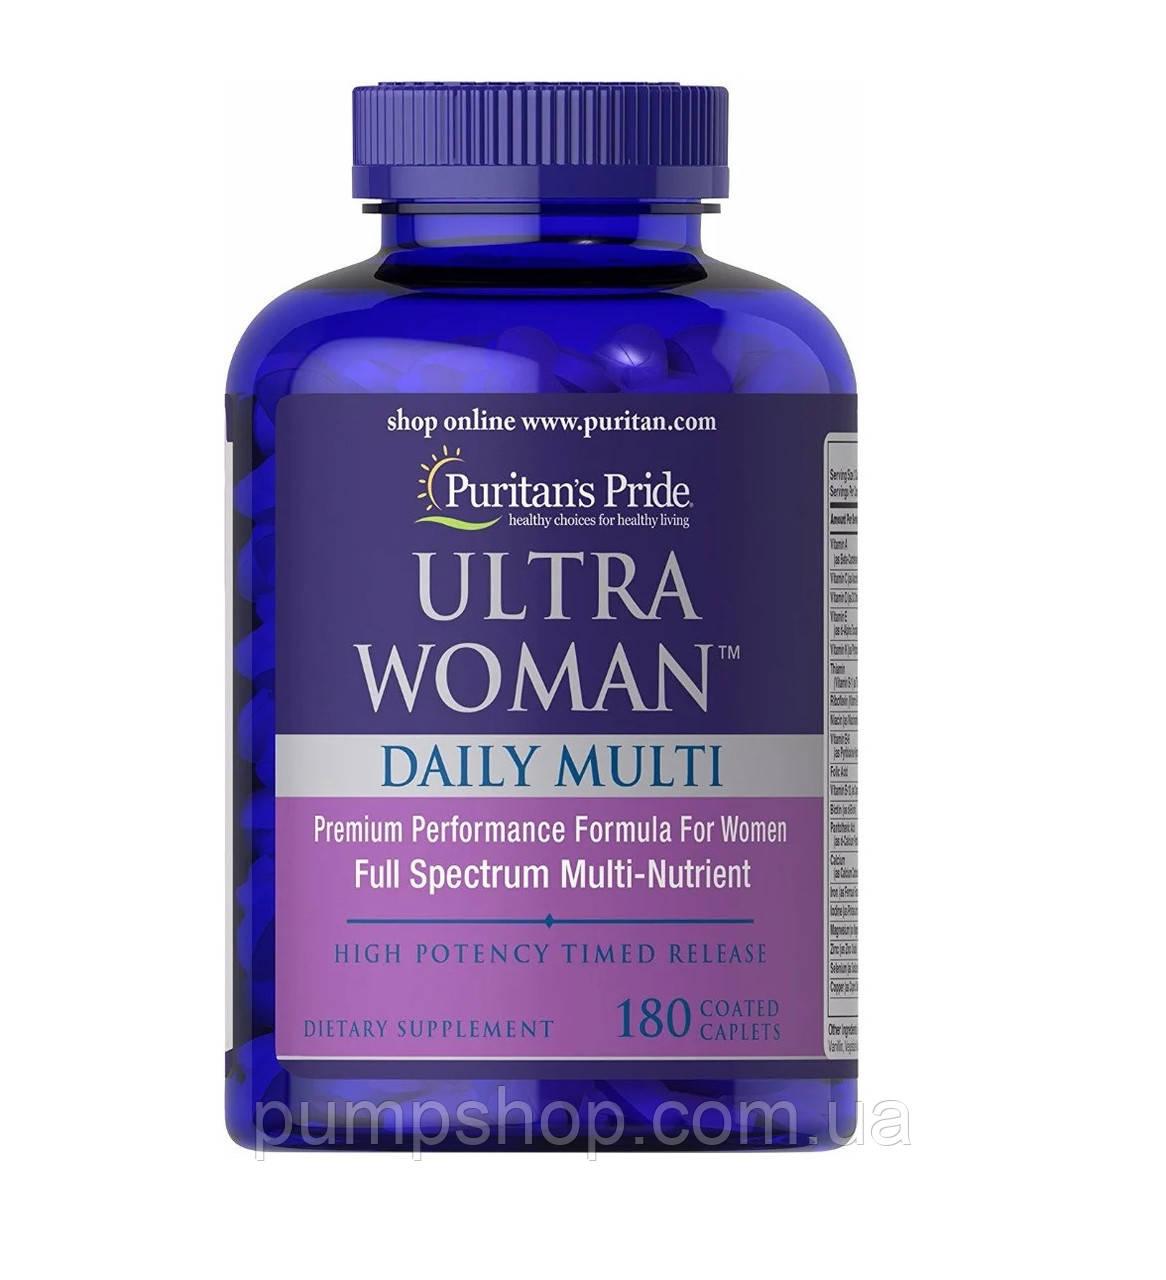 Витамины для женщин Puritan's Pride Ultra Woman™ Daily Multi 180 таб.